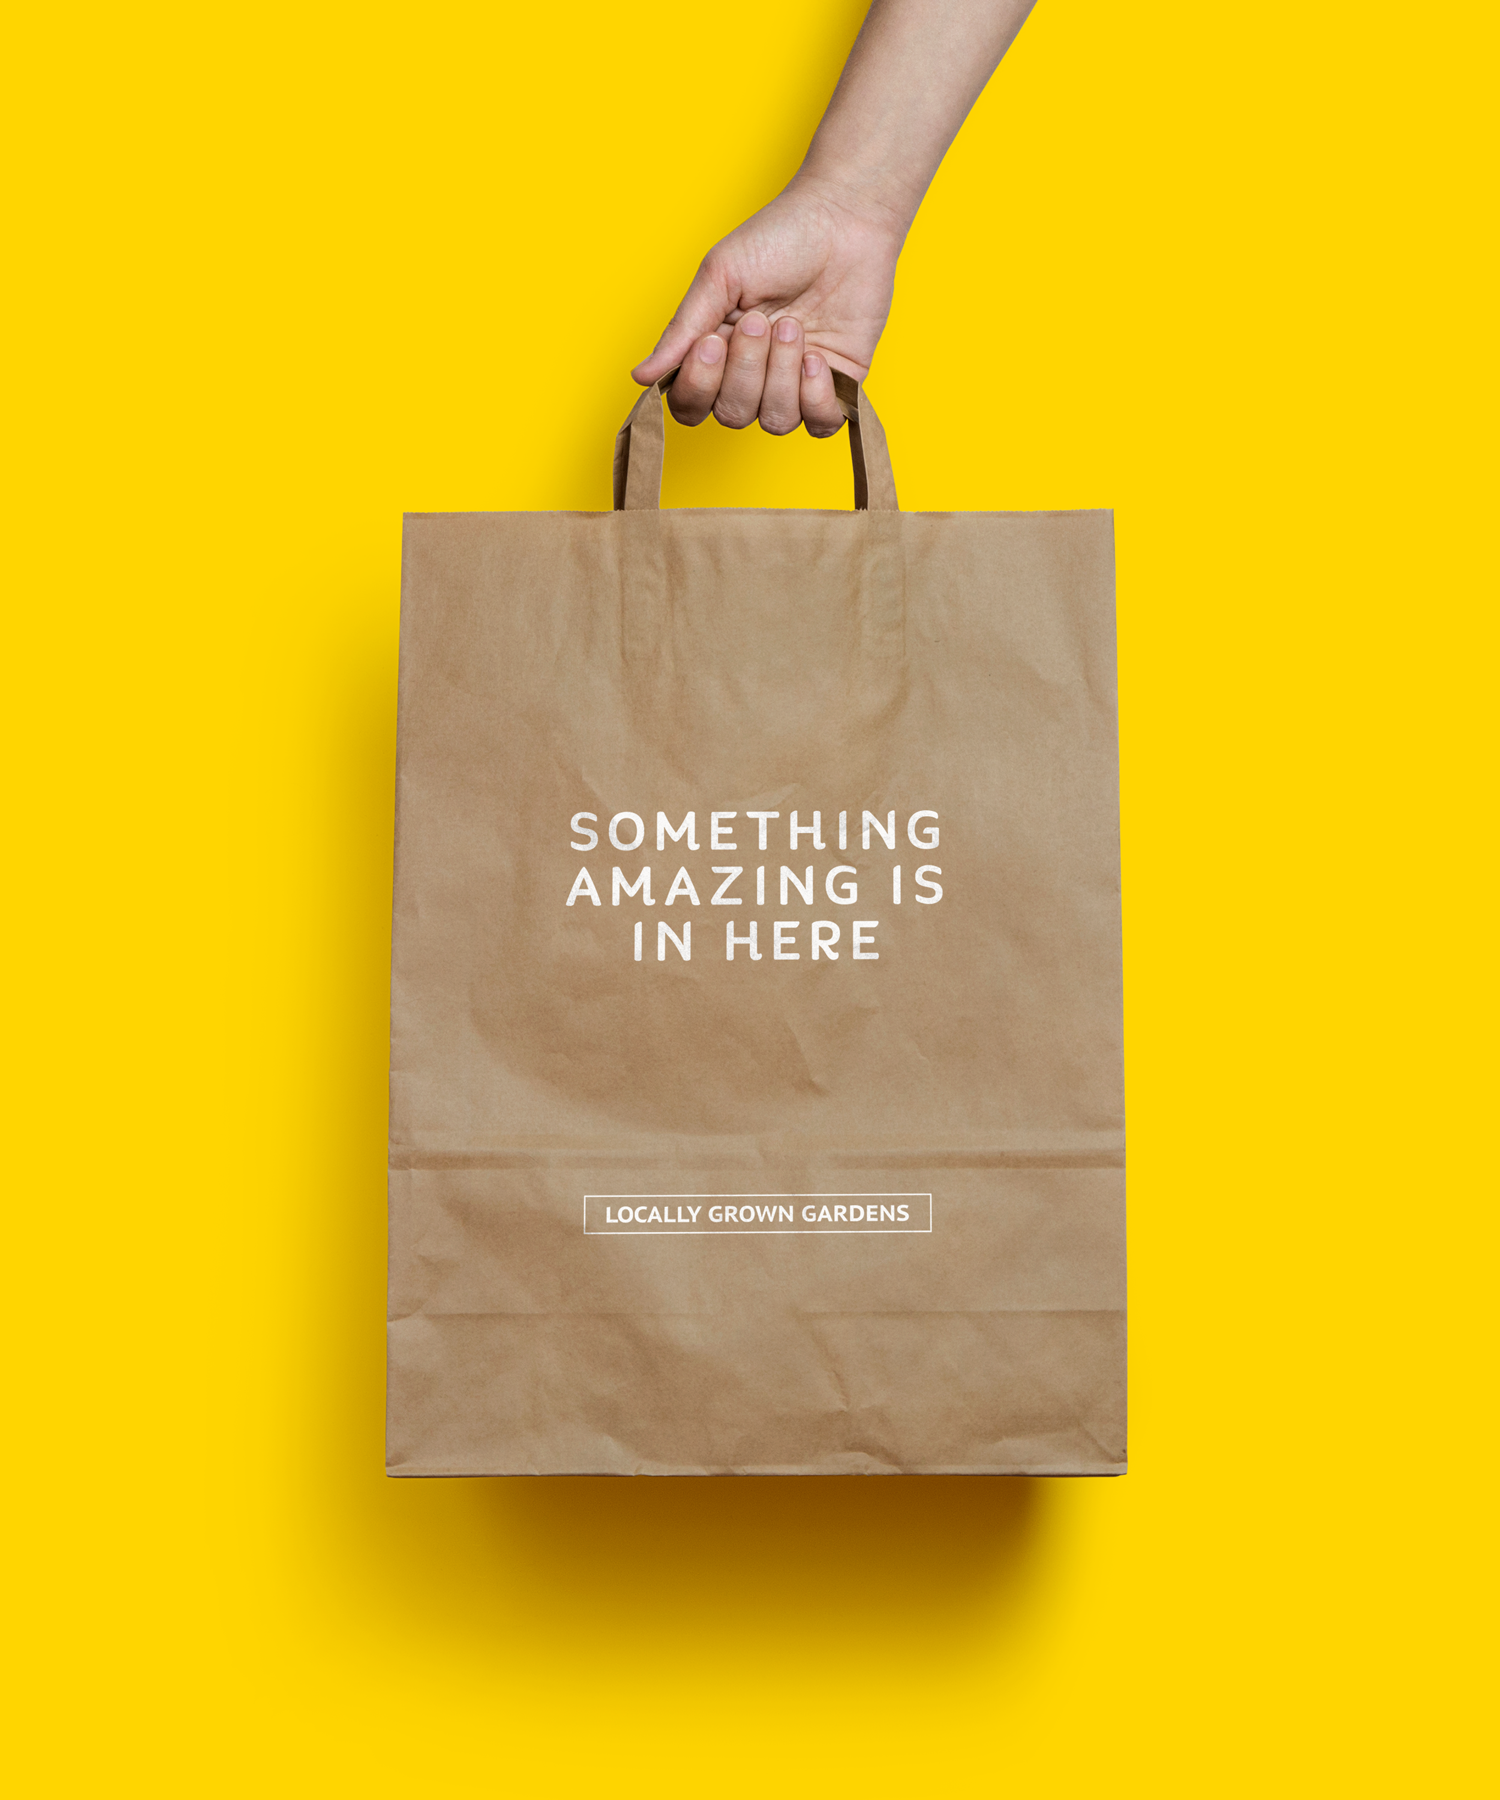 zachary_anton_reeves_brainding_design_bag.png